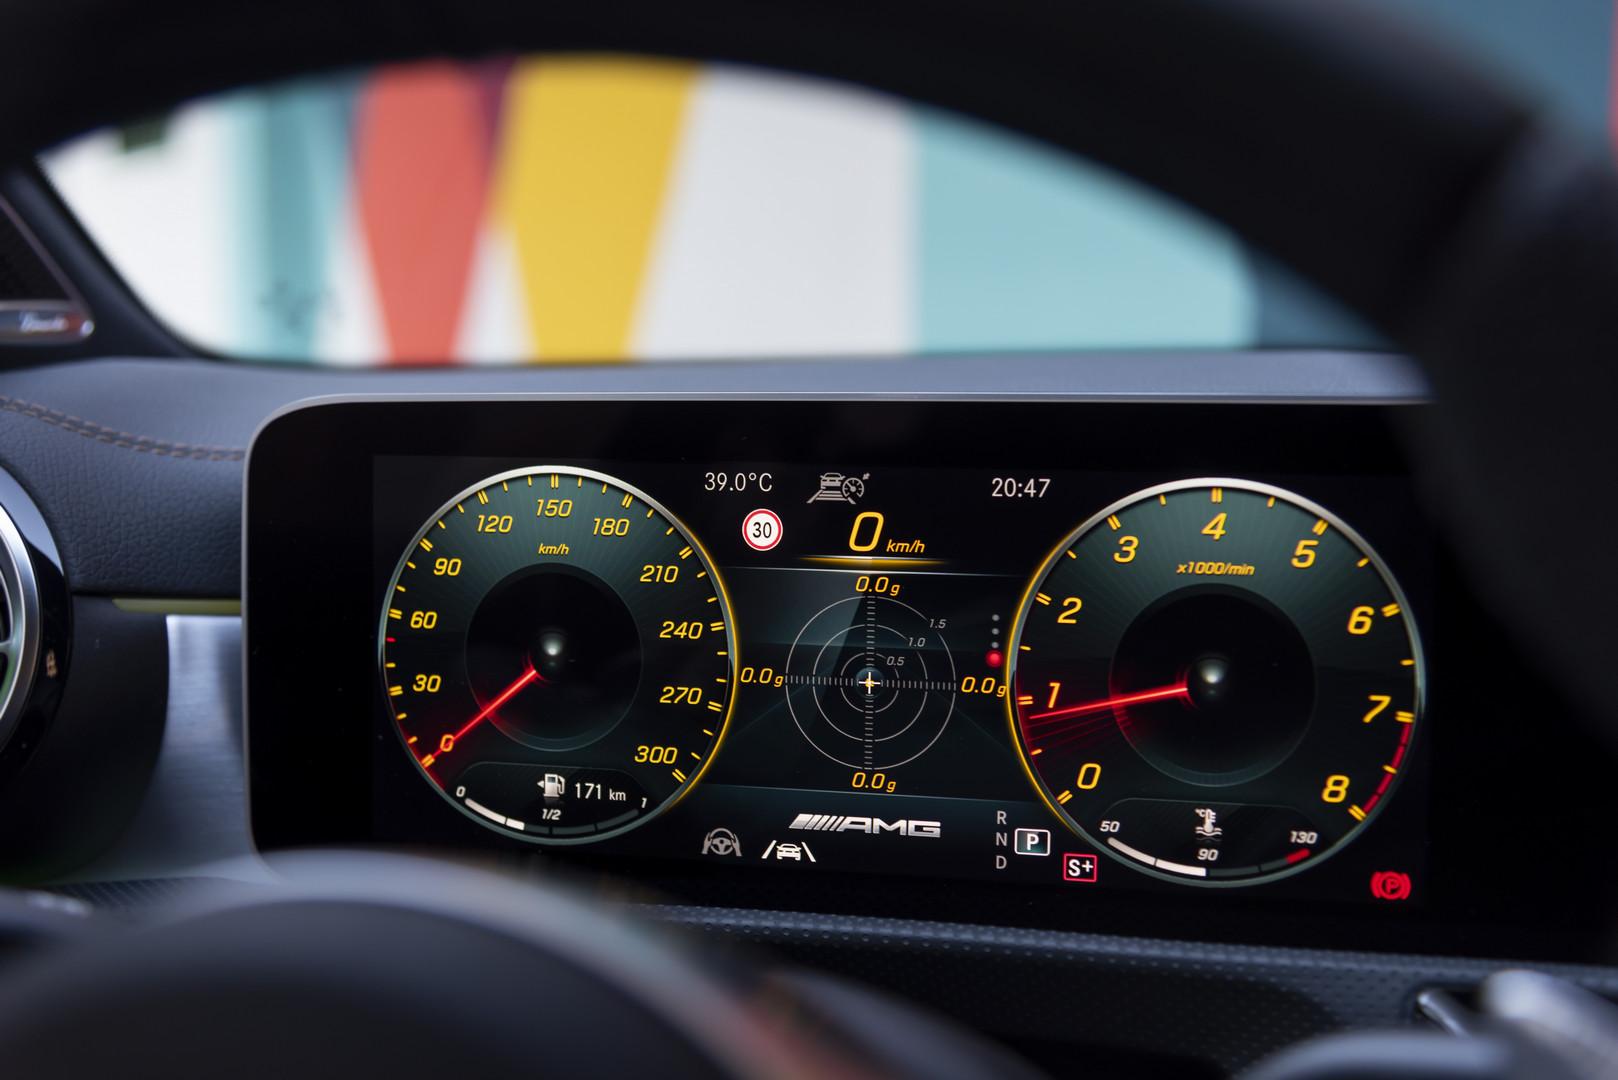 A45 S AMG Screens